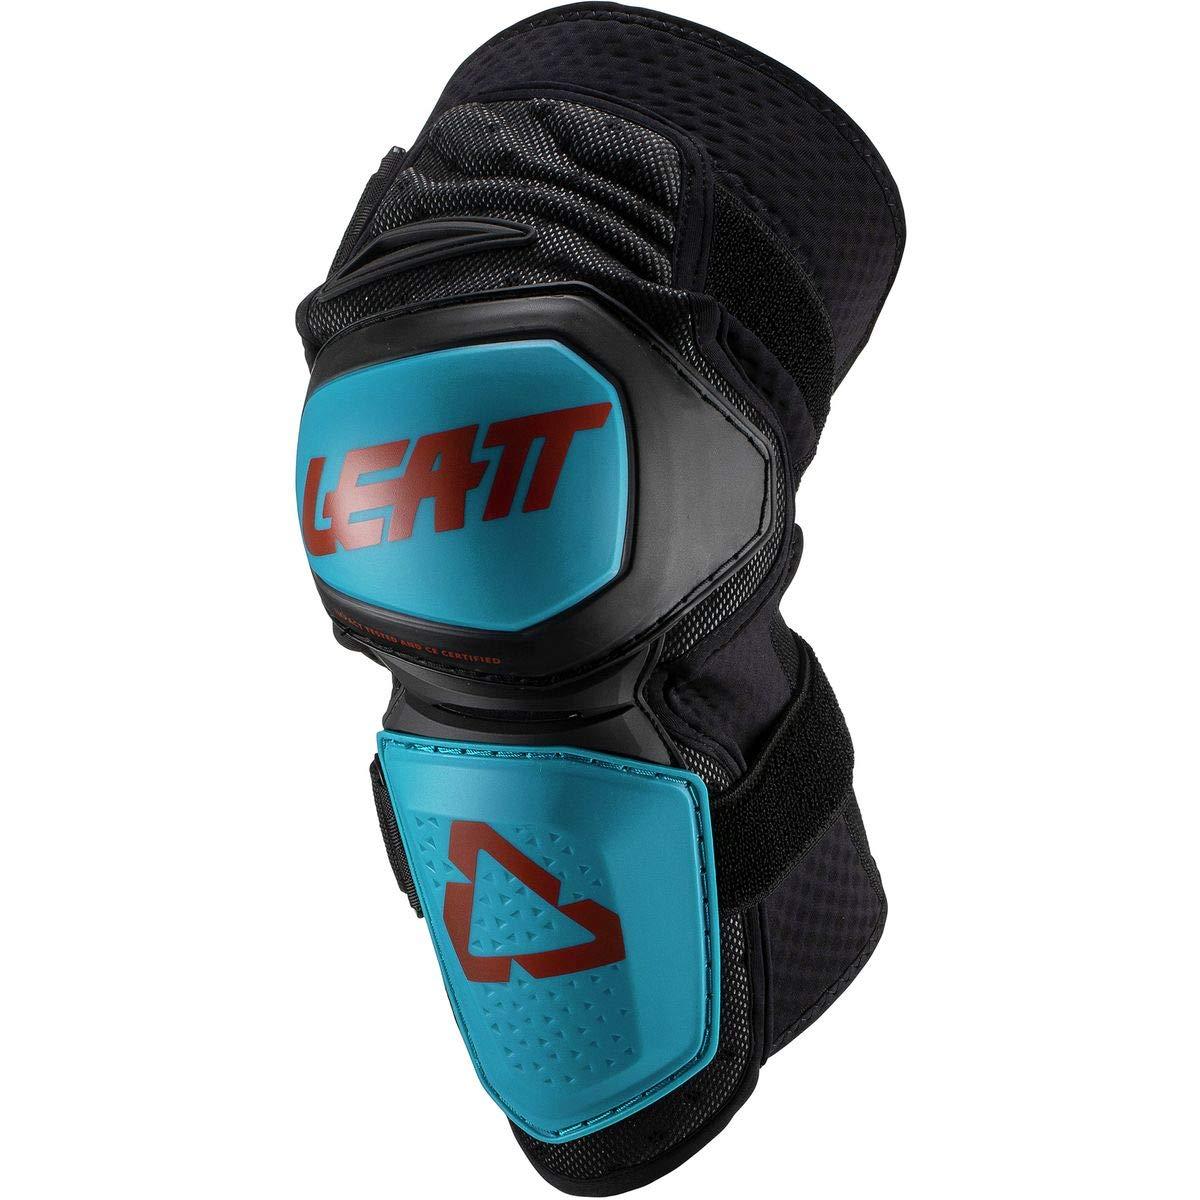 Leatt 3DF Enduro Adult Off-Road BMX Cycling Knee Guard